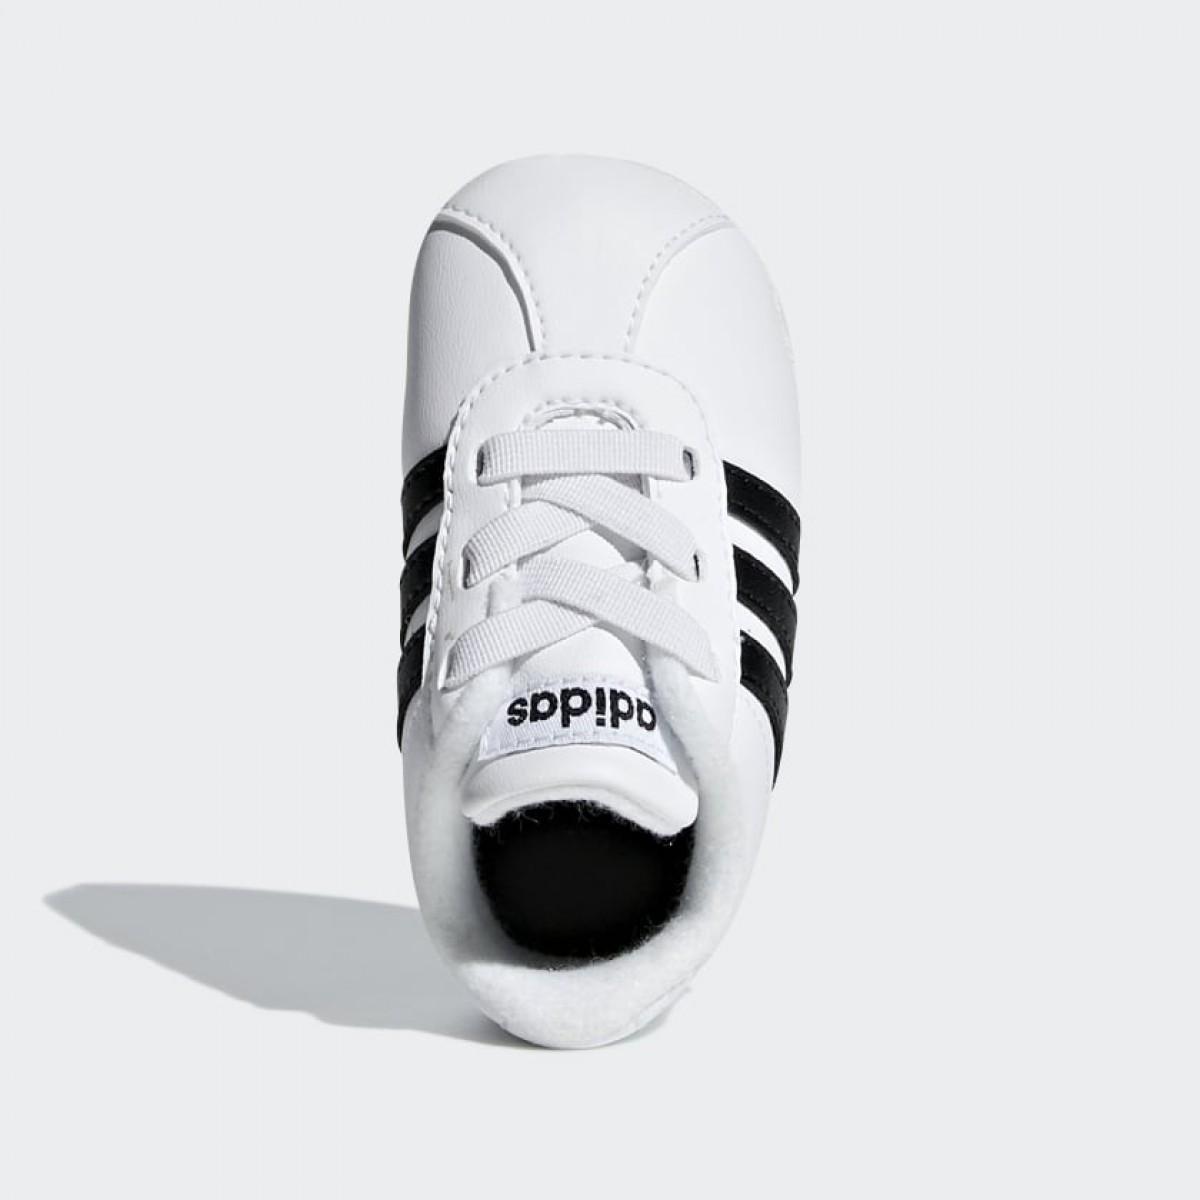 Baby 2 0 Adidas Schuh Court Vl Tscqdrh IY6gbfy7vm